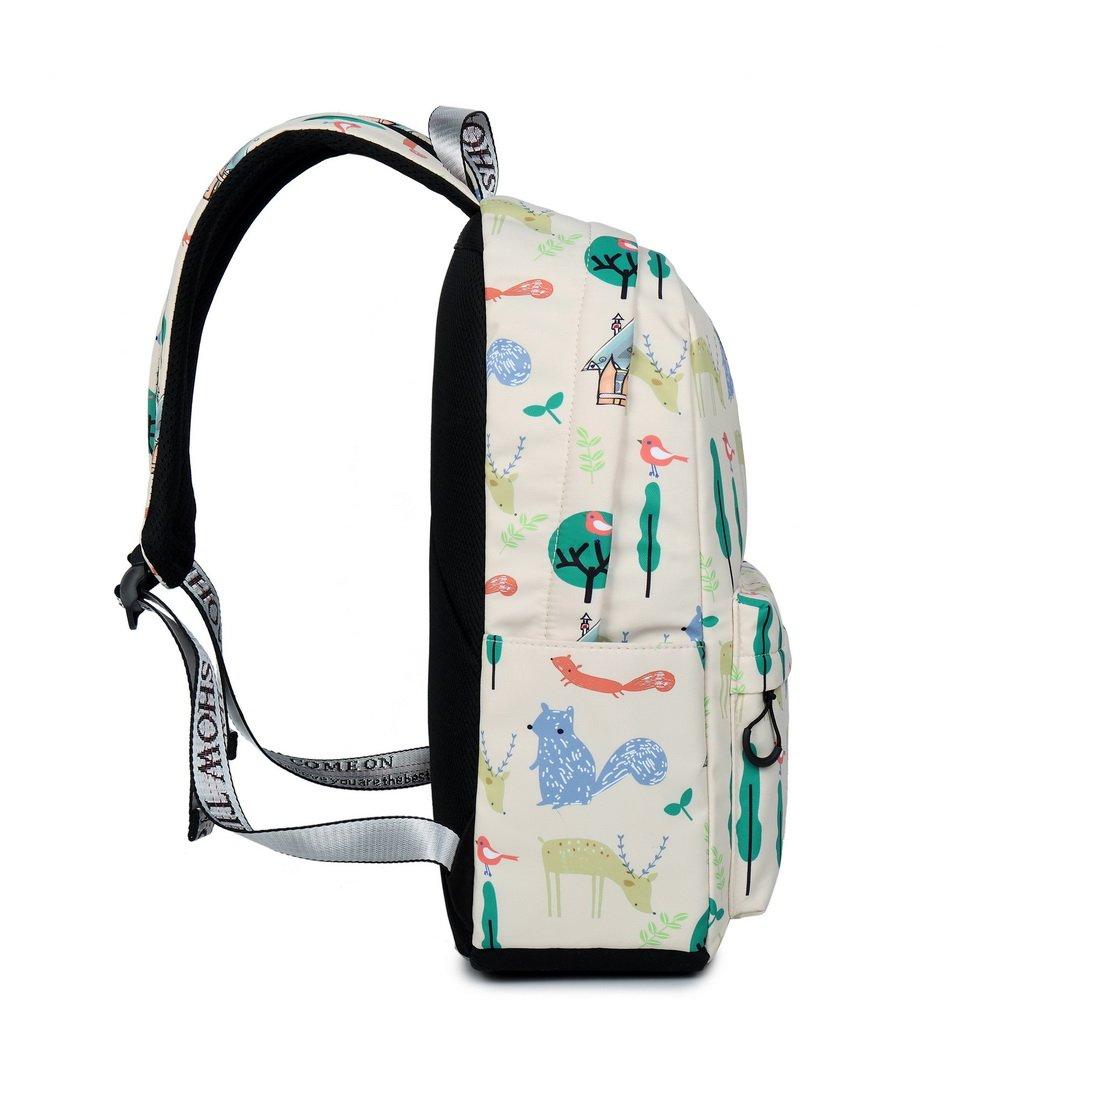 Amazon.com   Joymoze Little Kid Backpack Lightweight Child School Bag Toddler Girl Backpack Squirrel   Kids Backpacks